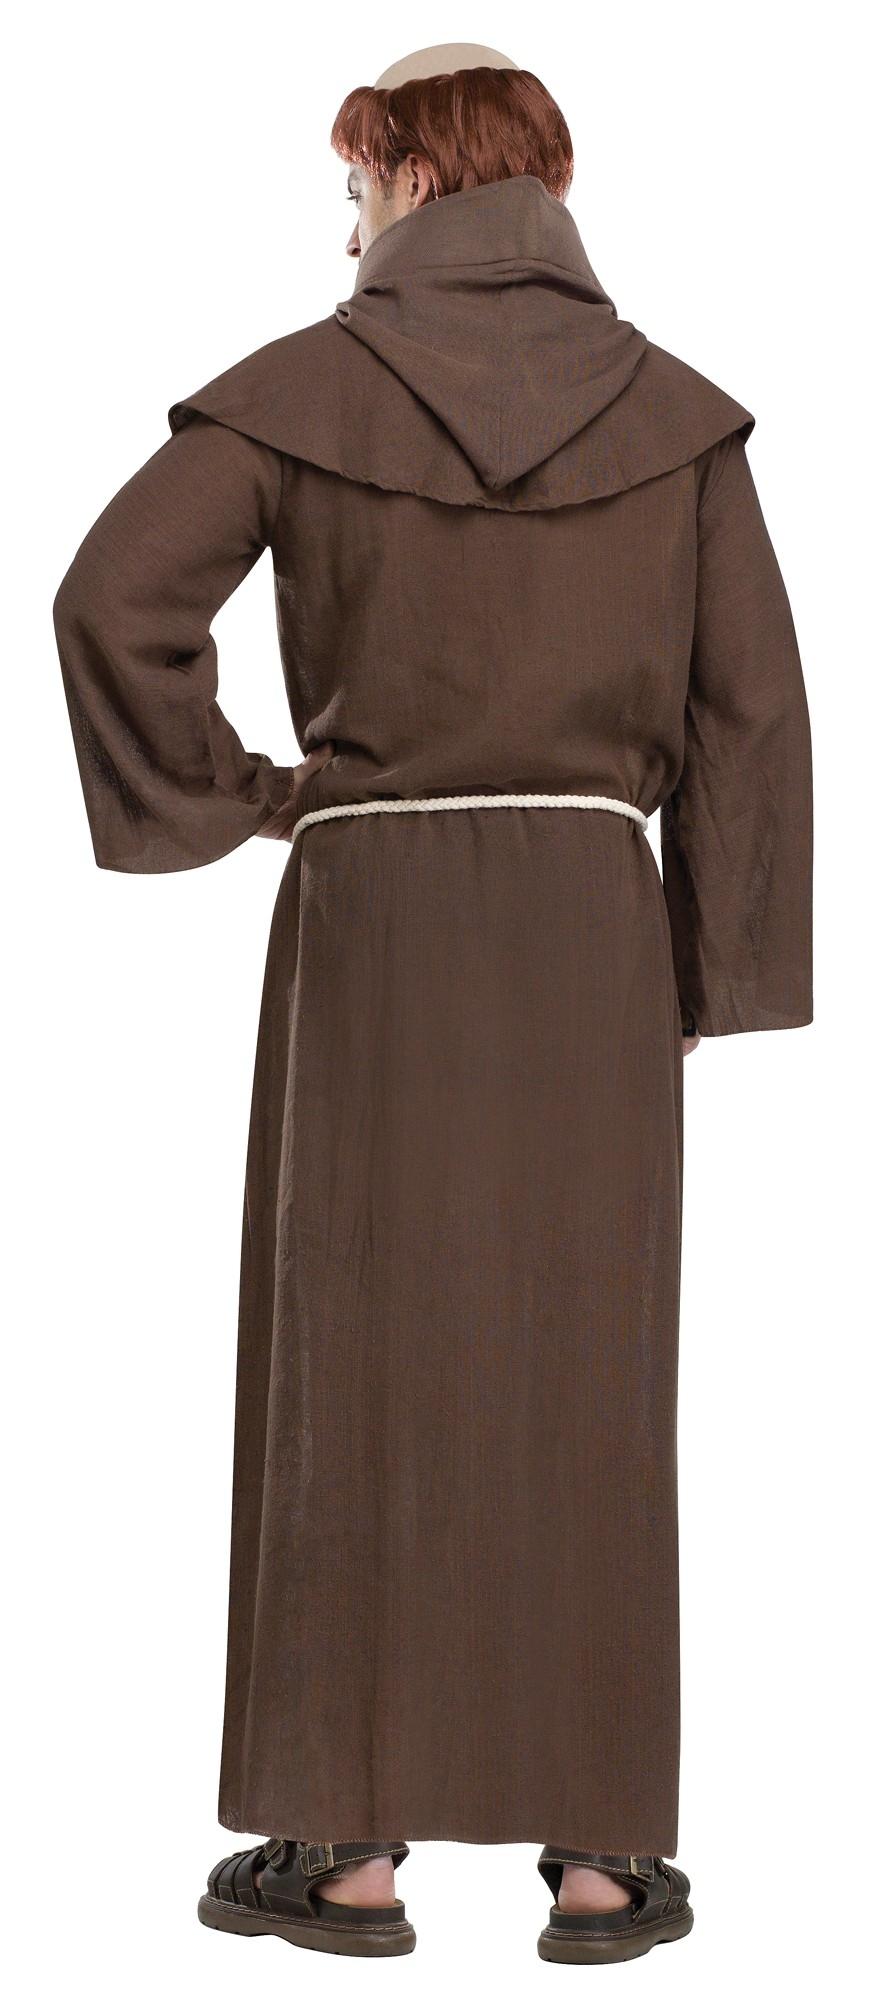 Костюм средневекового монаха (46) от Vkostume